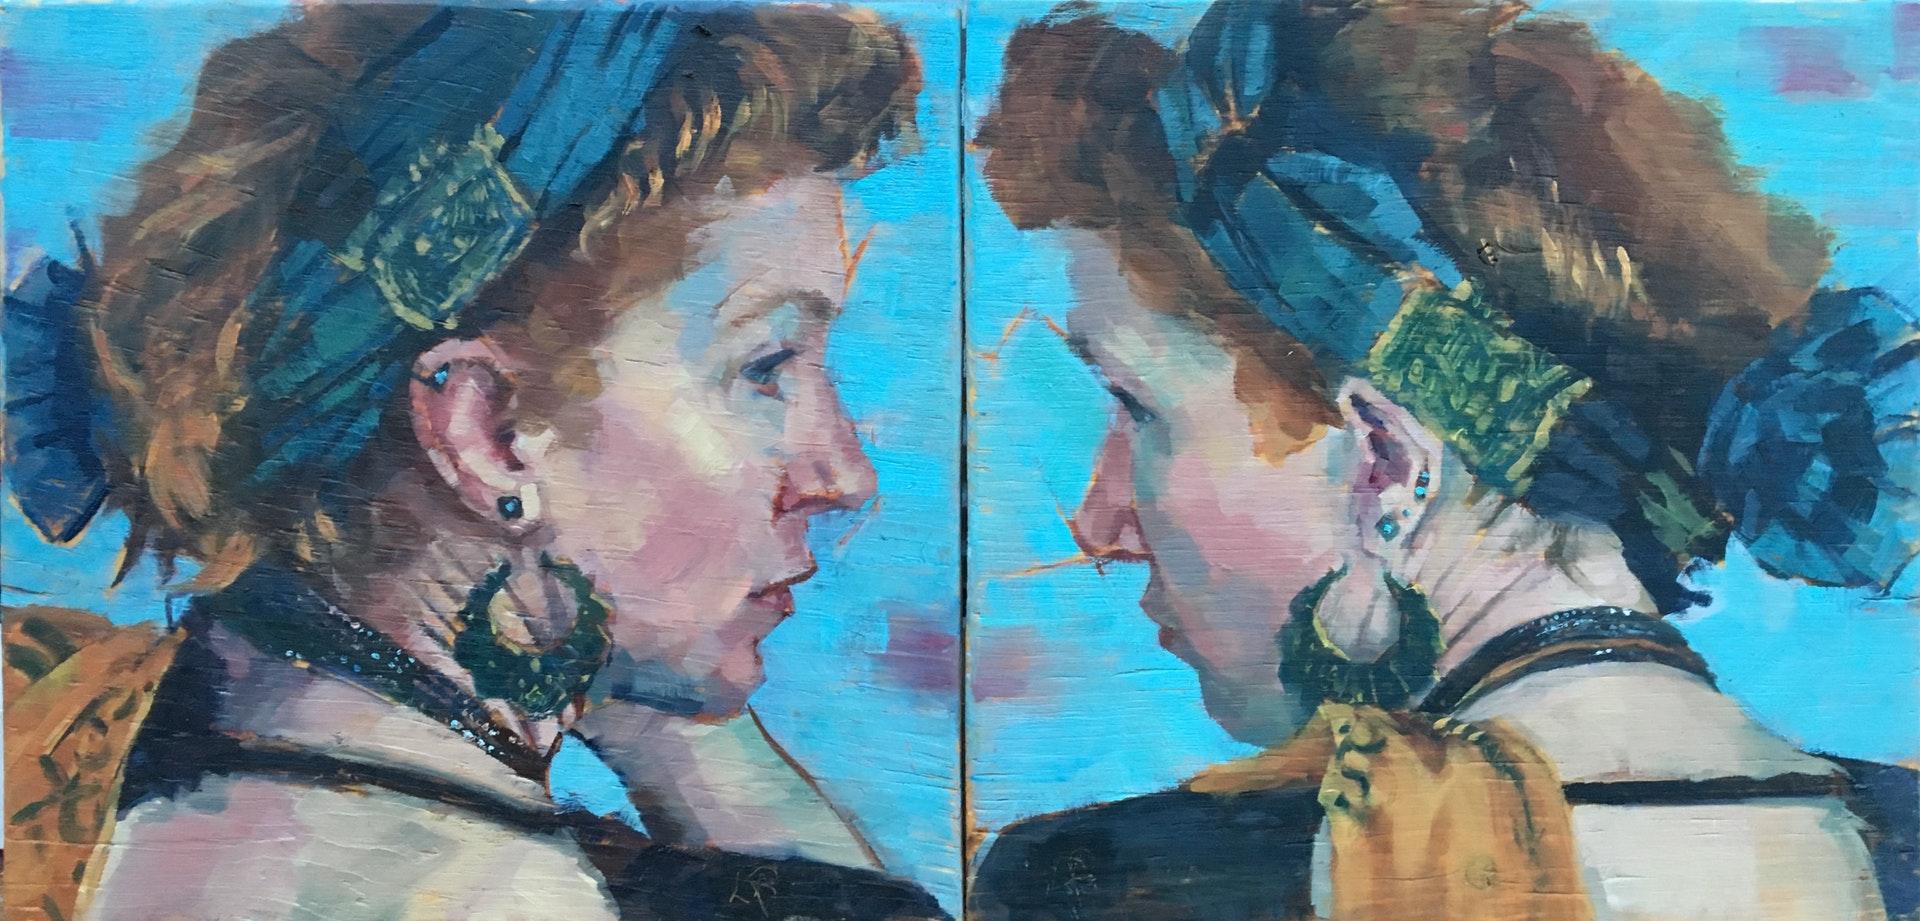 'Duality (diptych)', Lisa Puhlhofer, Oil on Board, 22.5 x 45 x 1 cm